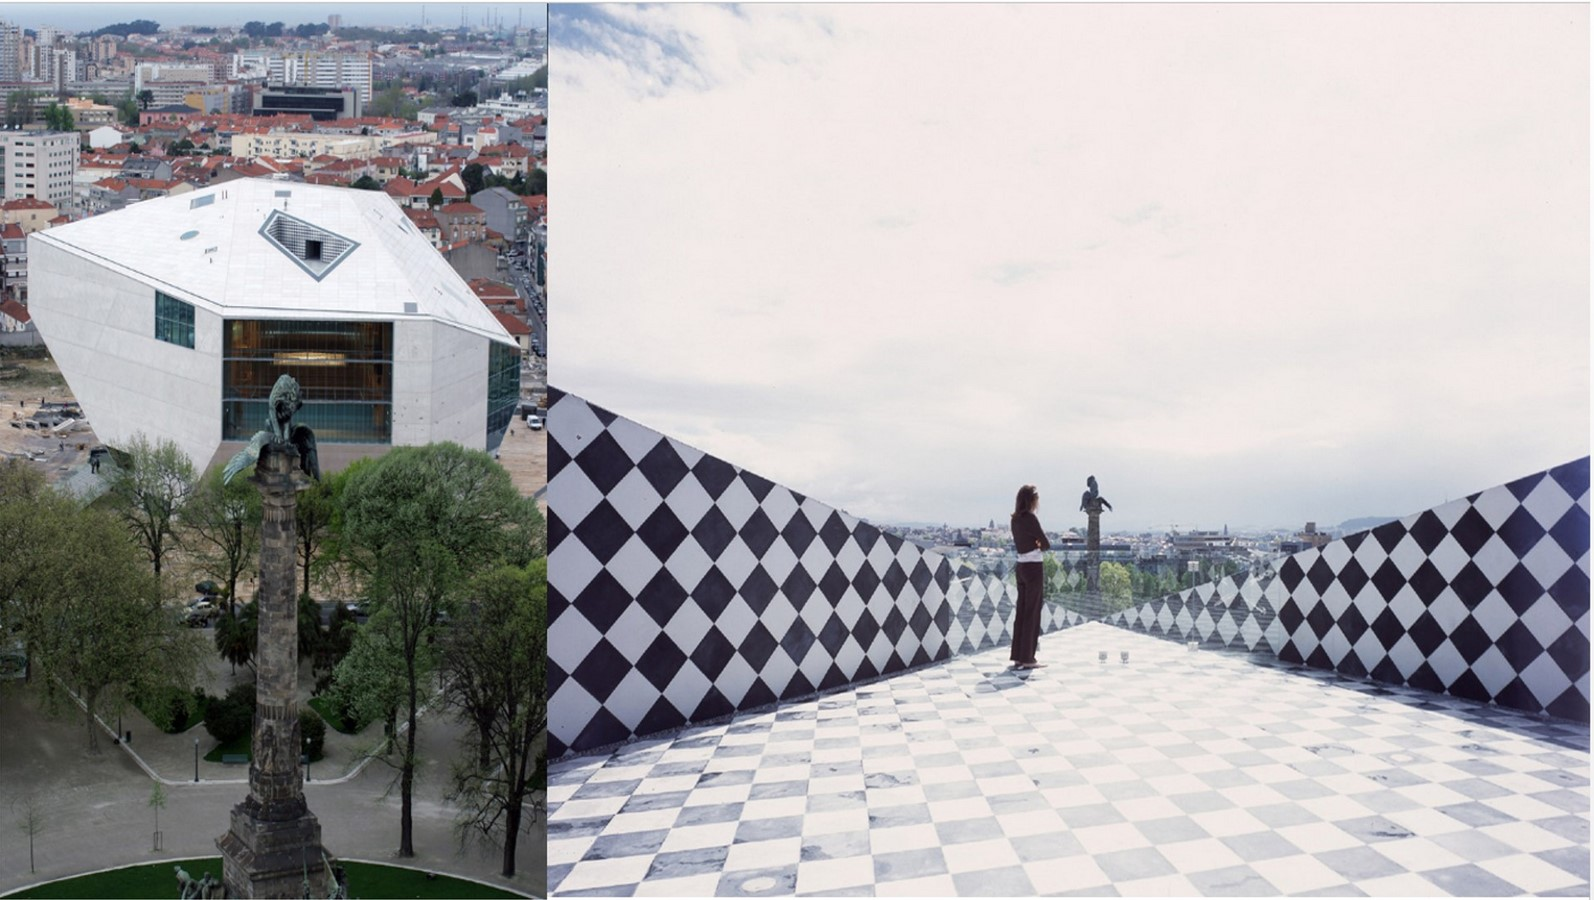 Casa Da Musica, Porto by Rem Koolhaas: The Asymmetrical Polyhedron - Sheet11